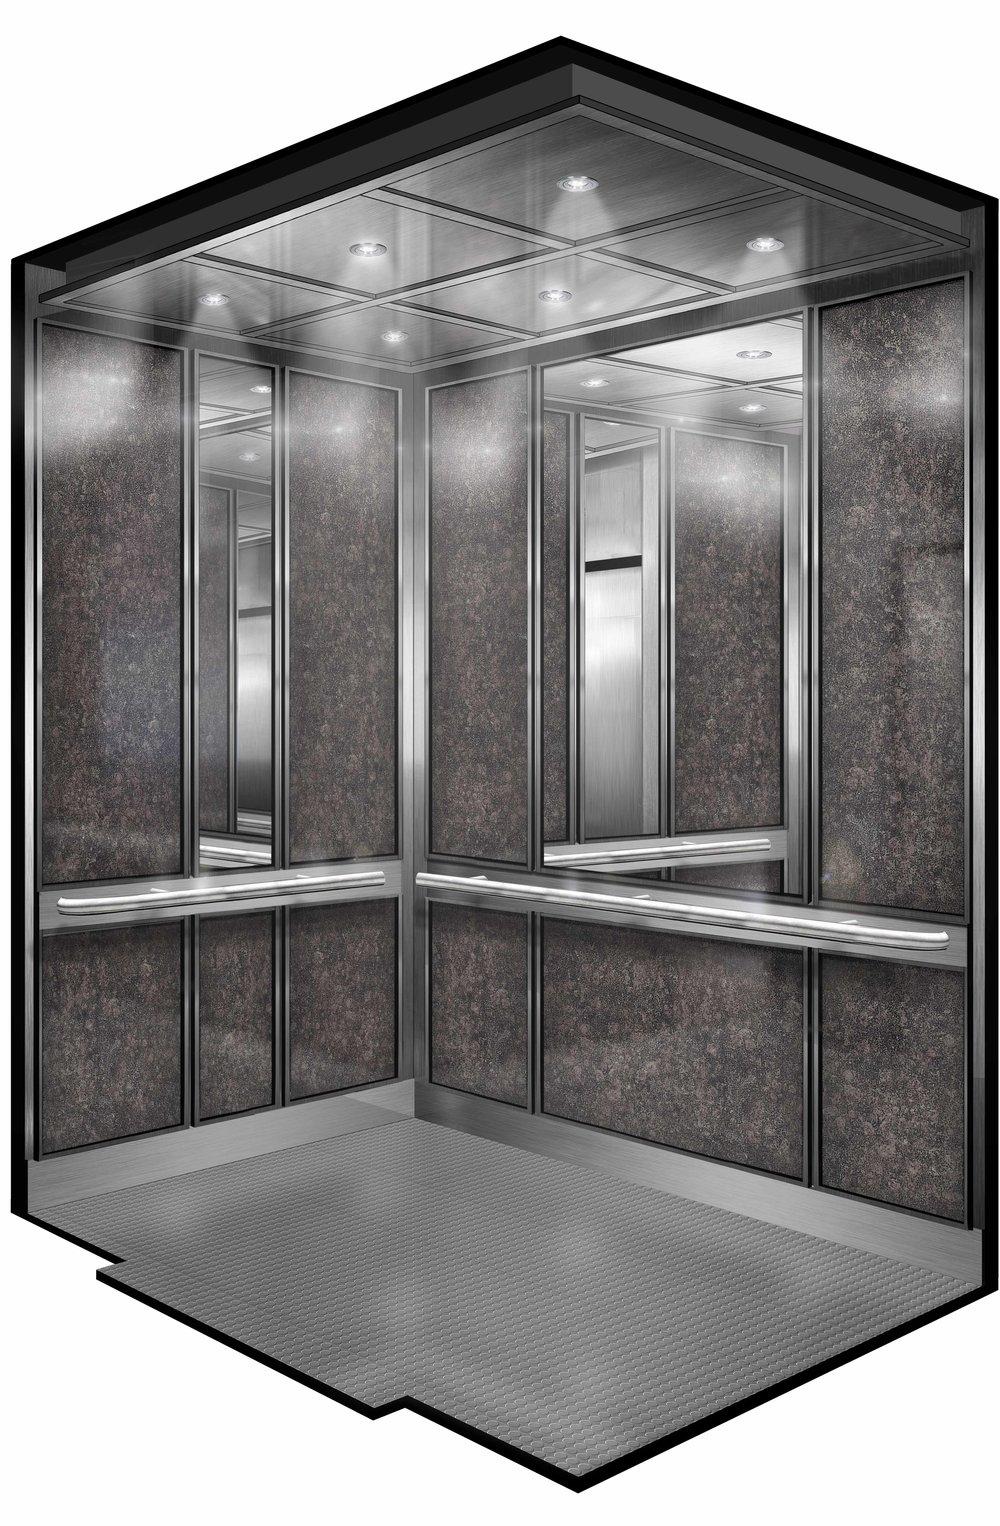 Elevator Interior Rendering